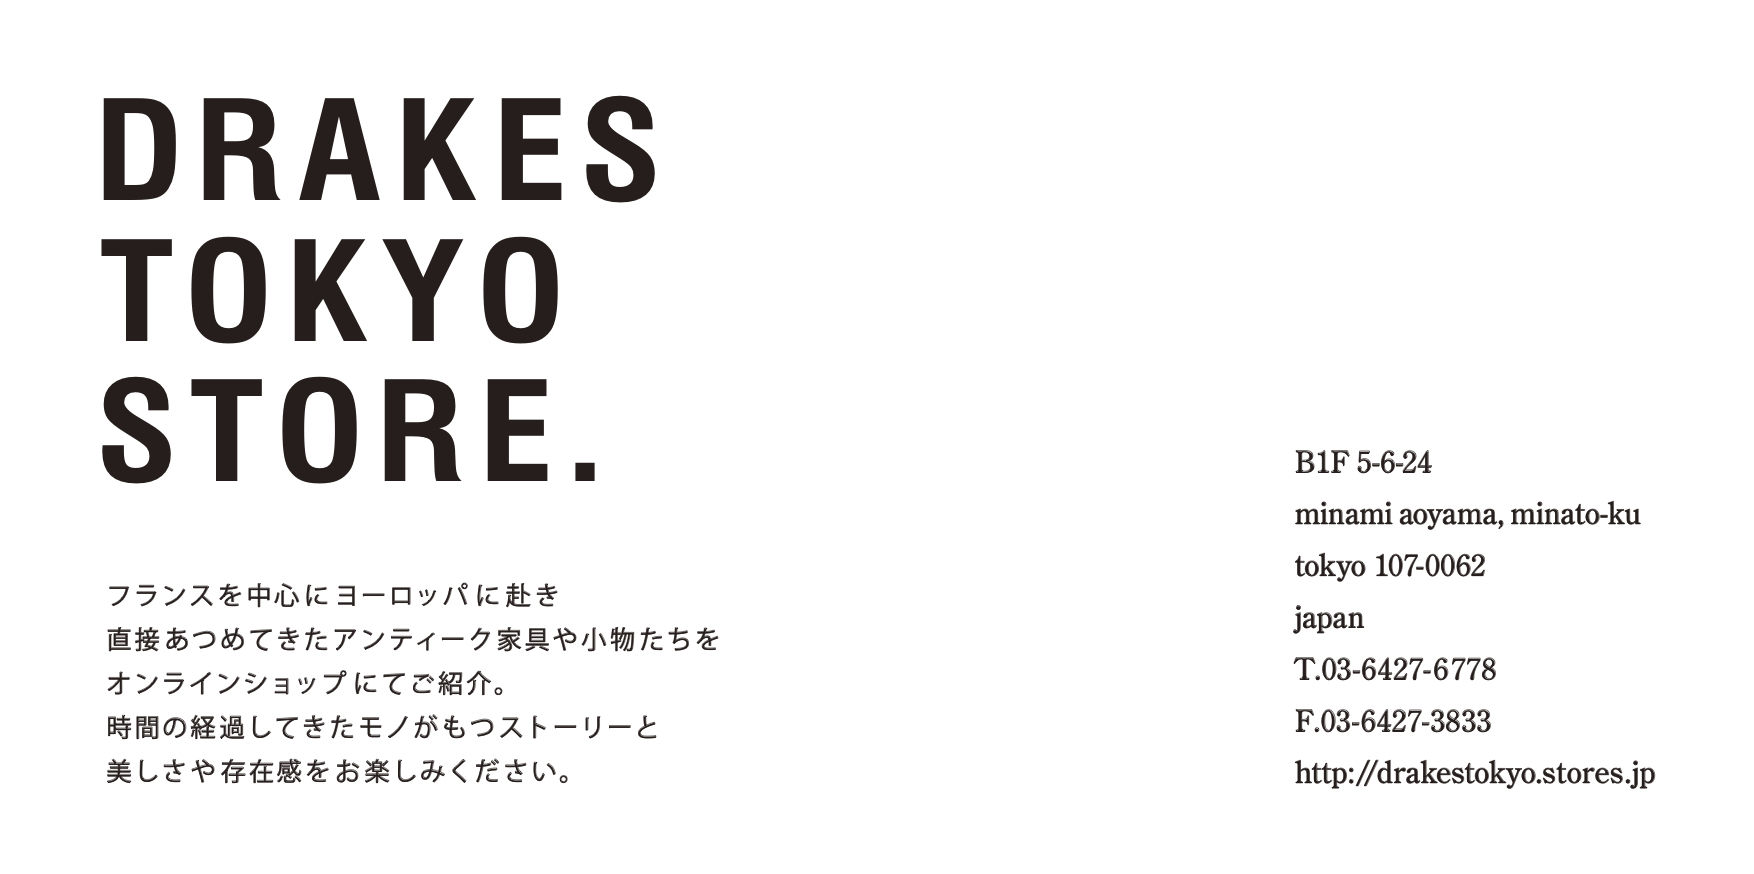 DRAKES TOKYO STORE.